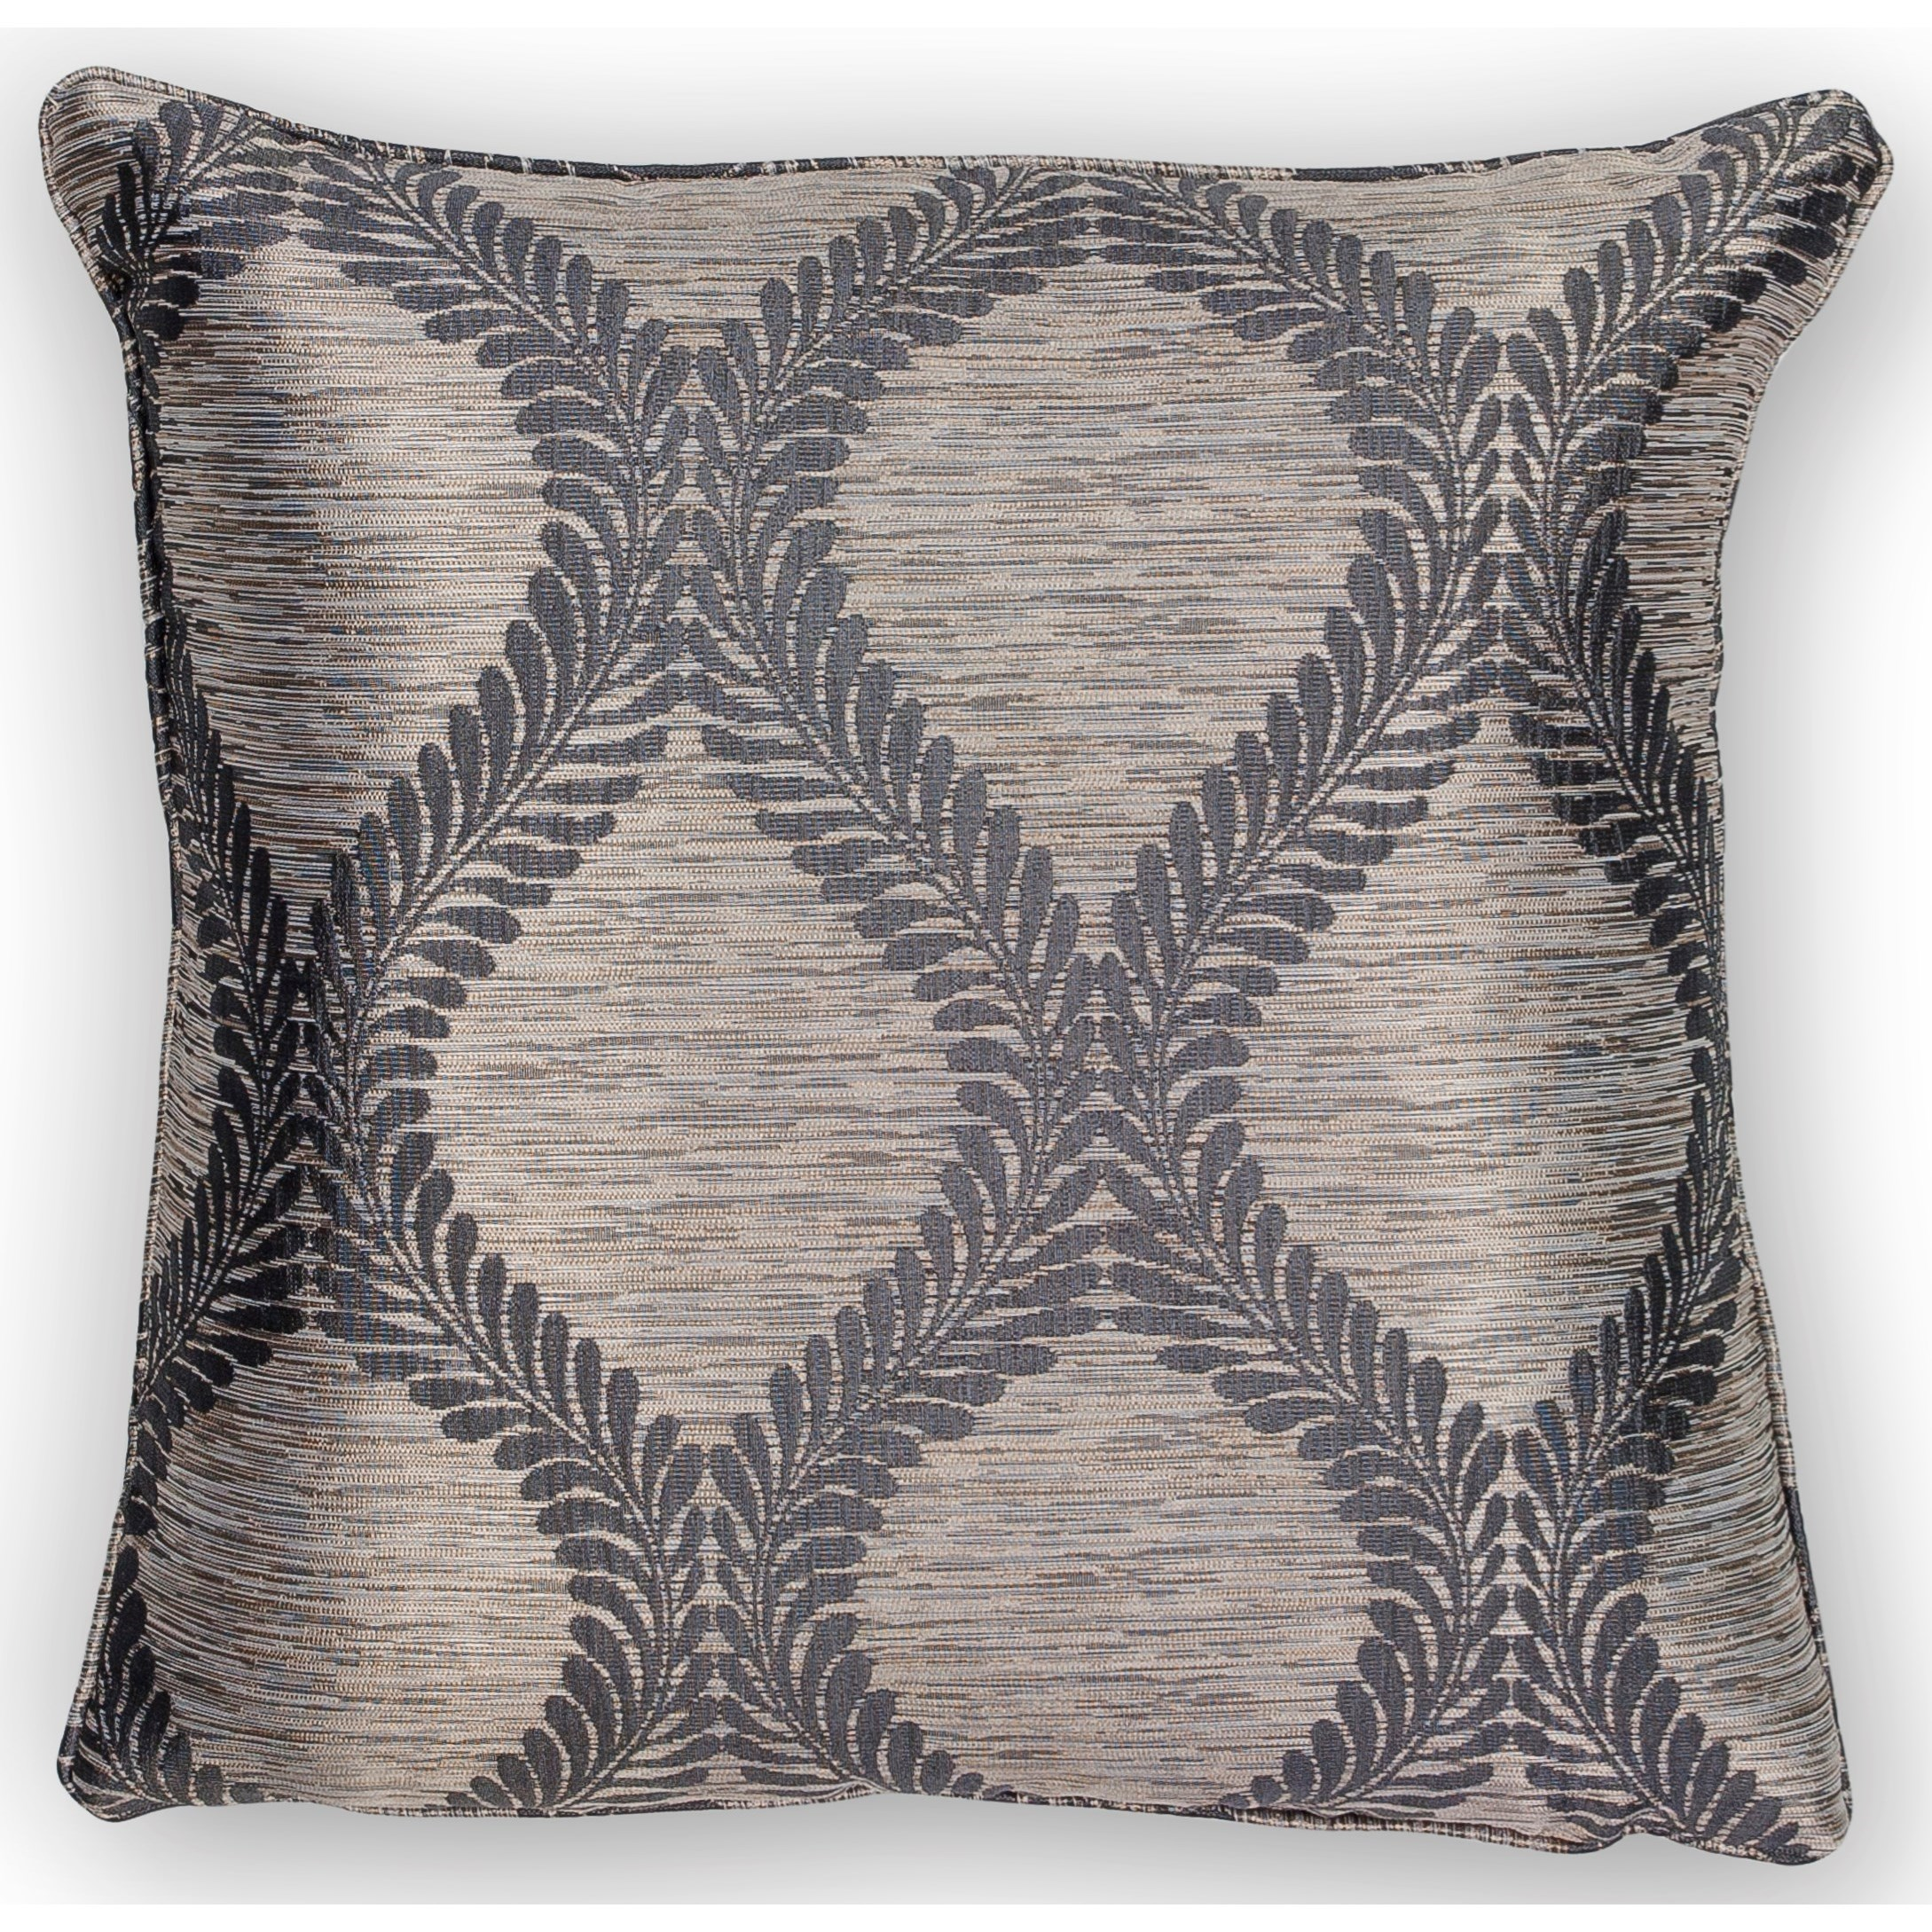 "Pillow 20"" X 20"" Grey Elegance Pillows by Kas at Zak's Home"